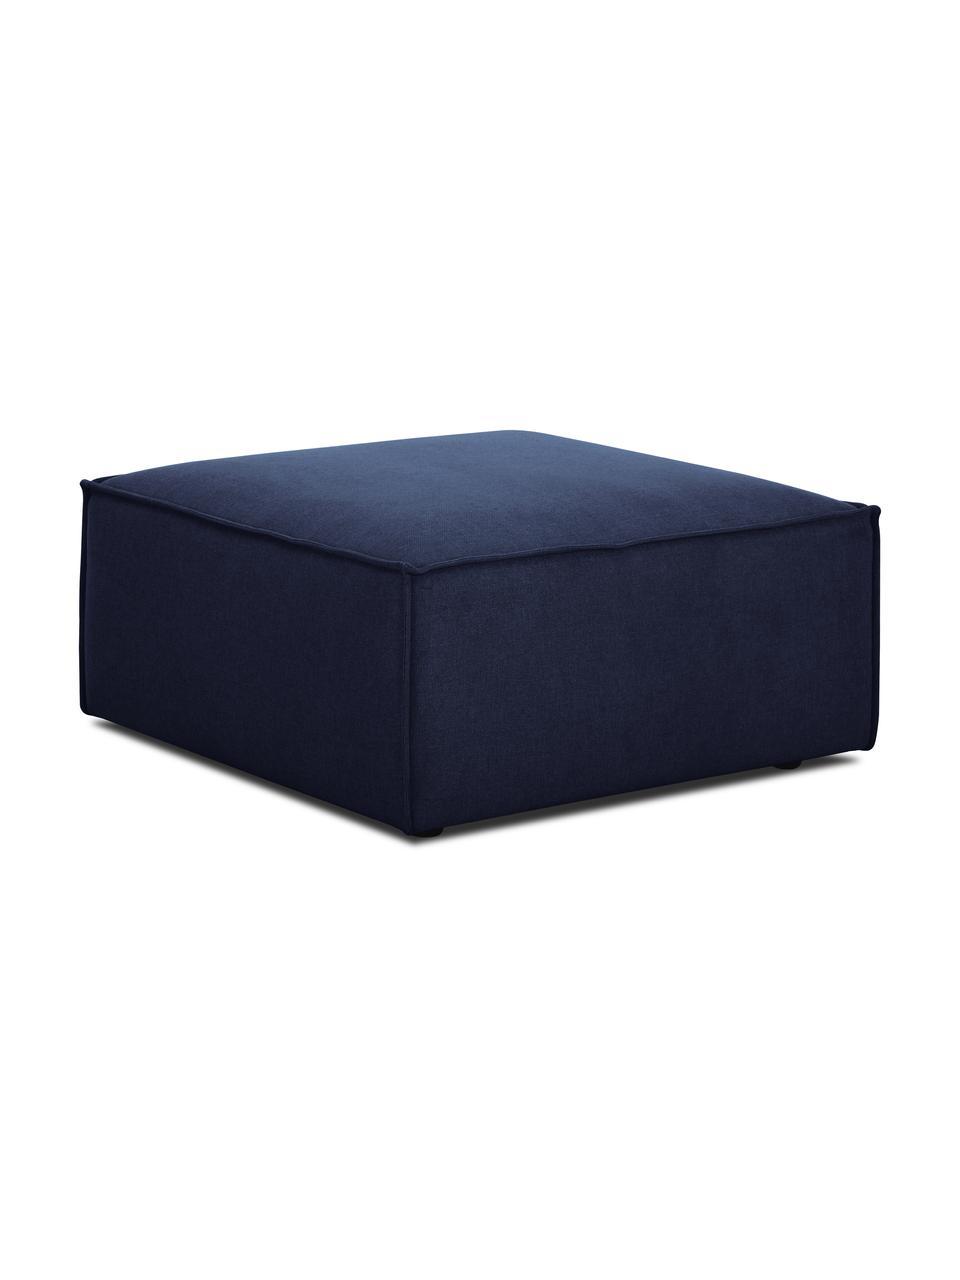 Sofa-Hocker Lennon in Blau, Bezug: 100% Polyester Der strapa, Gestell: Massives Kiefernholz, Spe, Füße: Kunststoff Die Füße befin, Webstoff Blau, 88 x 43 cm